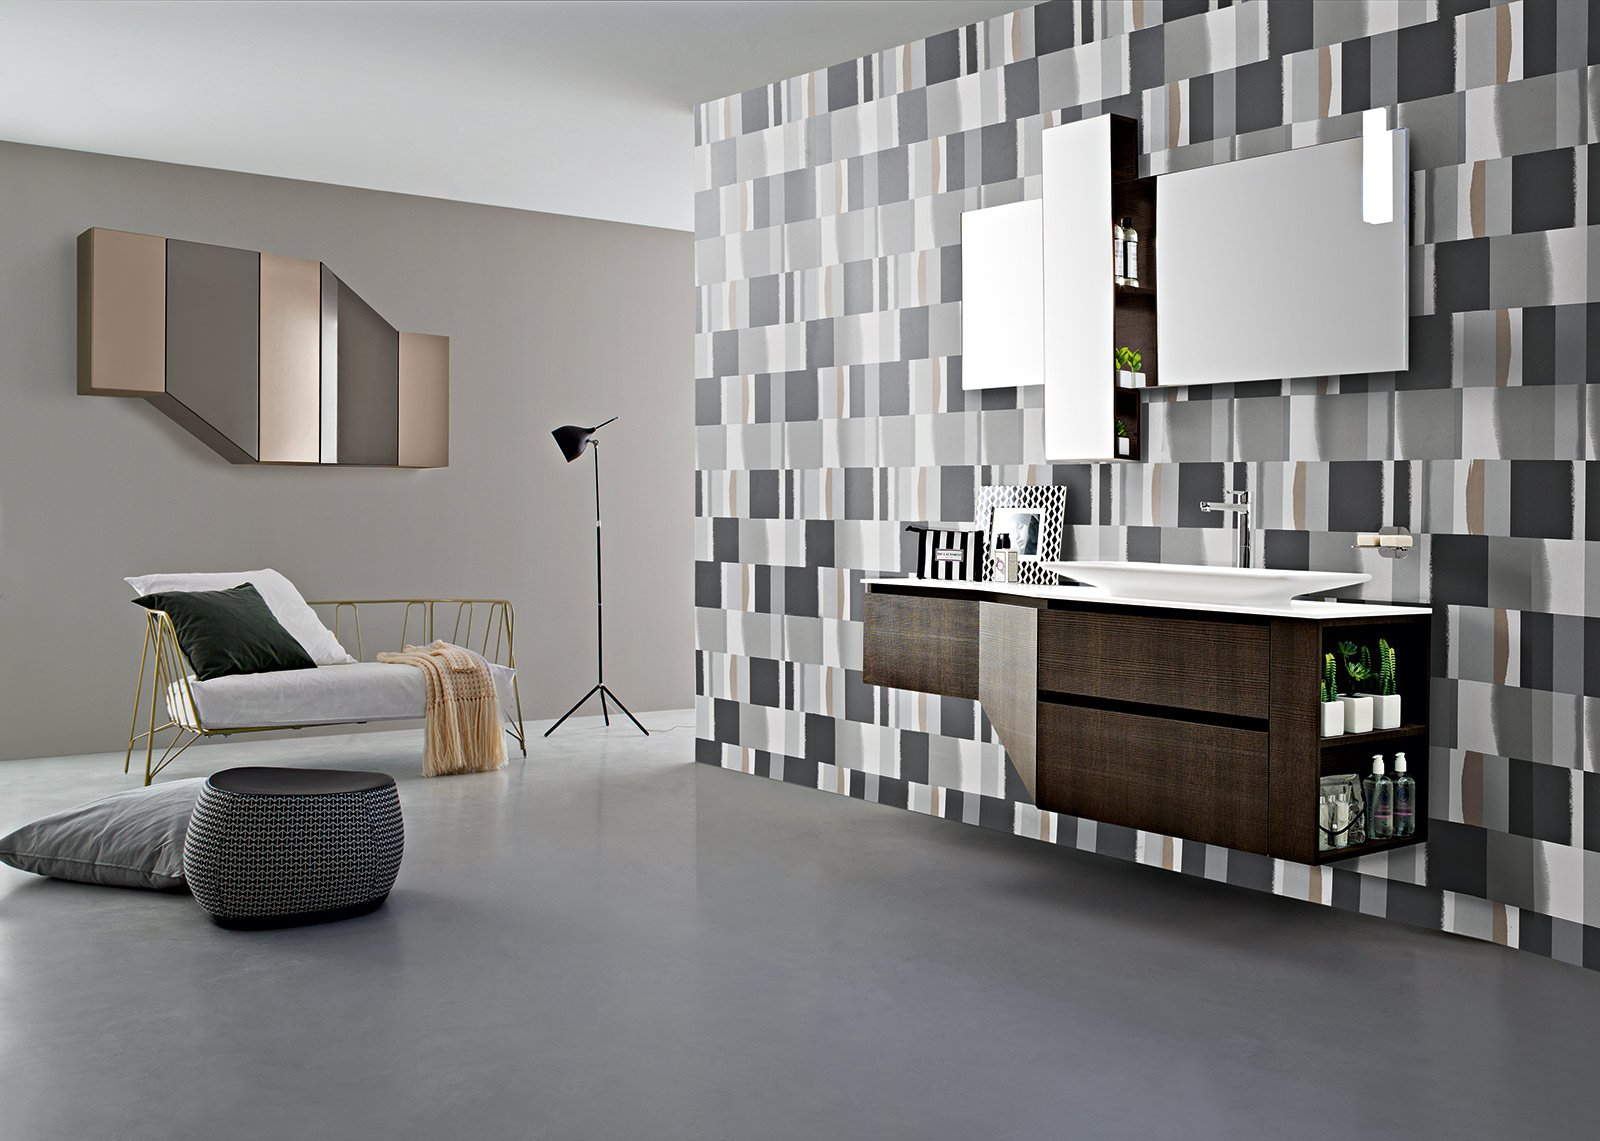 Cerasa joy mobililavabo cose di casa - Cerasa mobili bagno ...